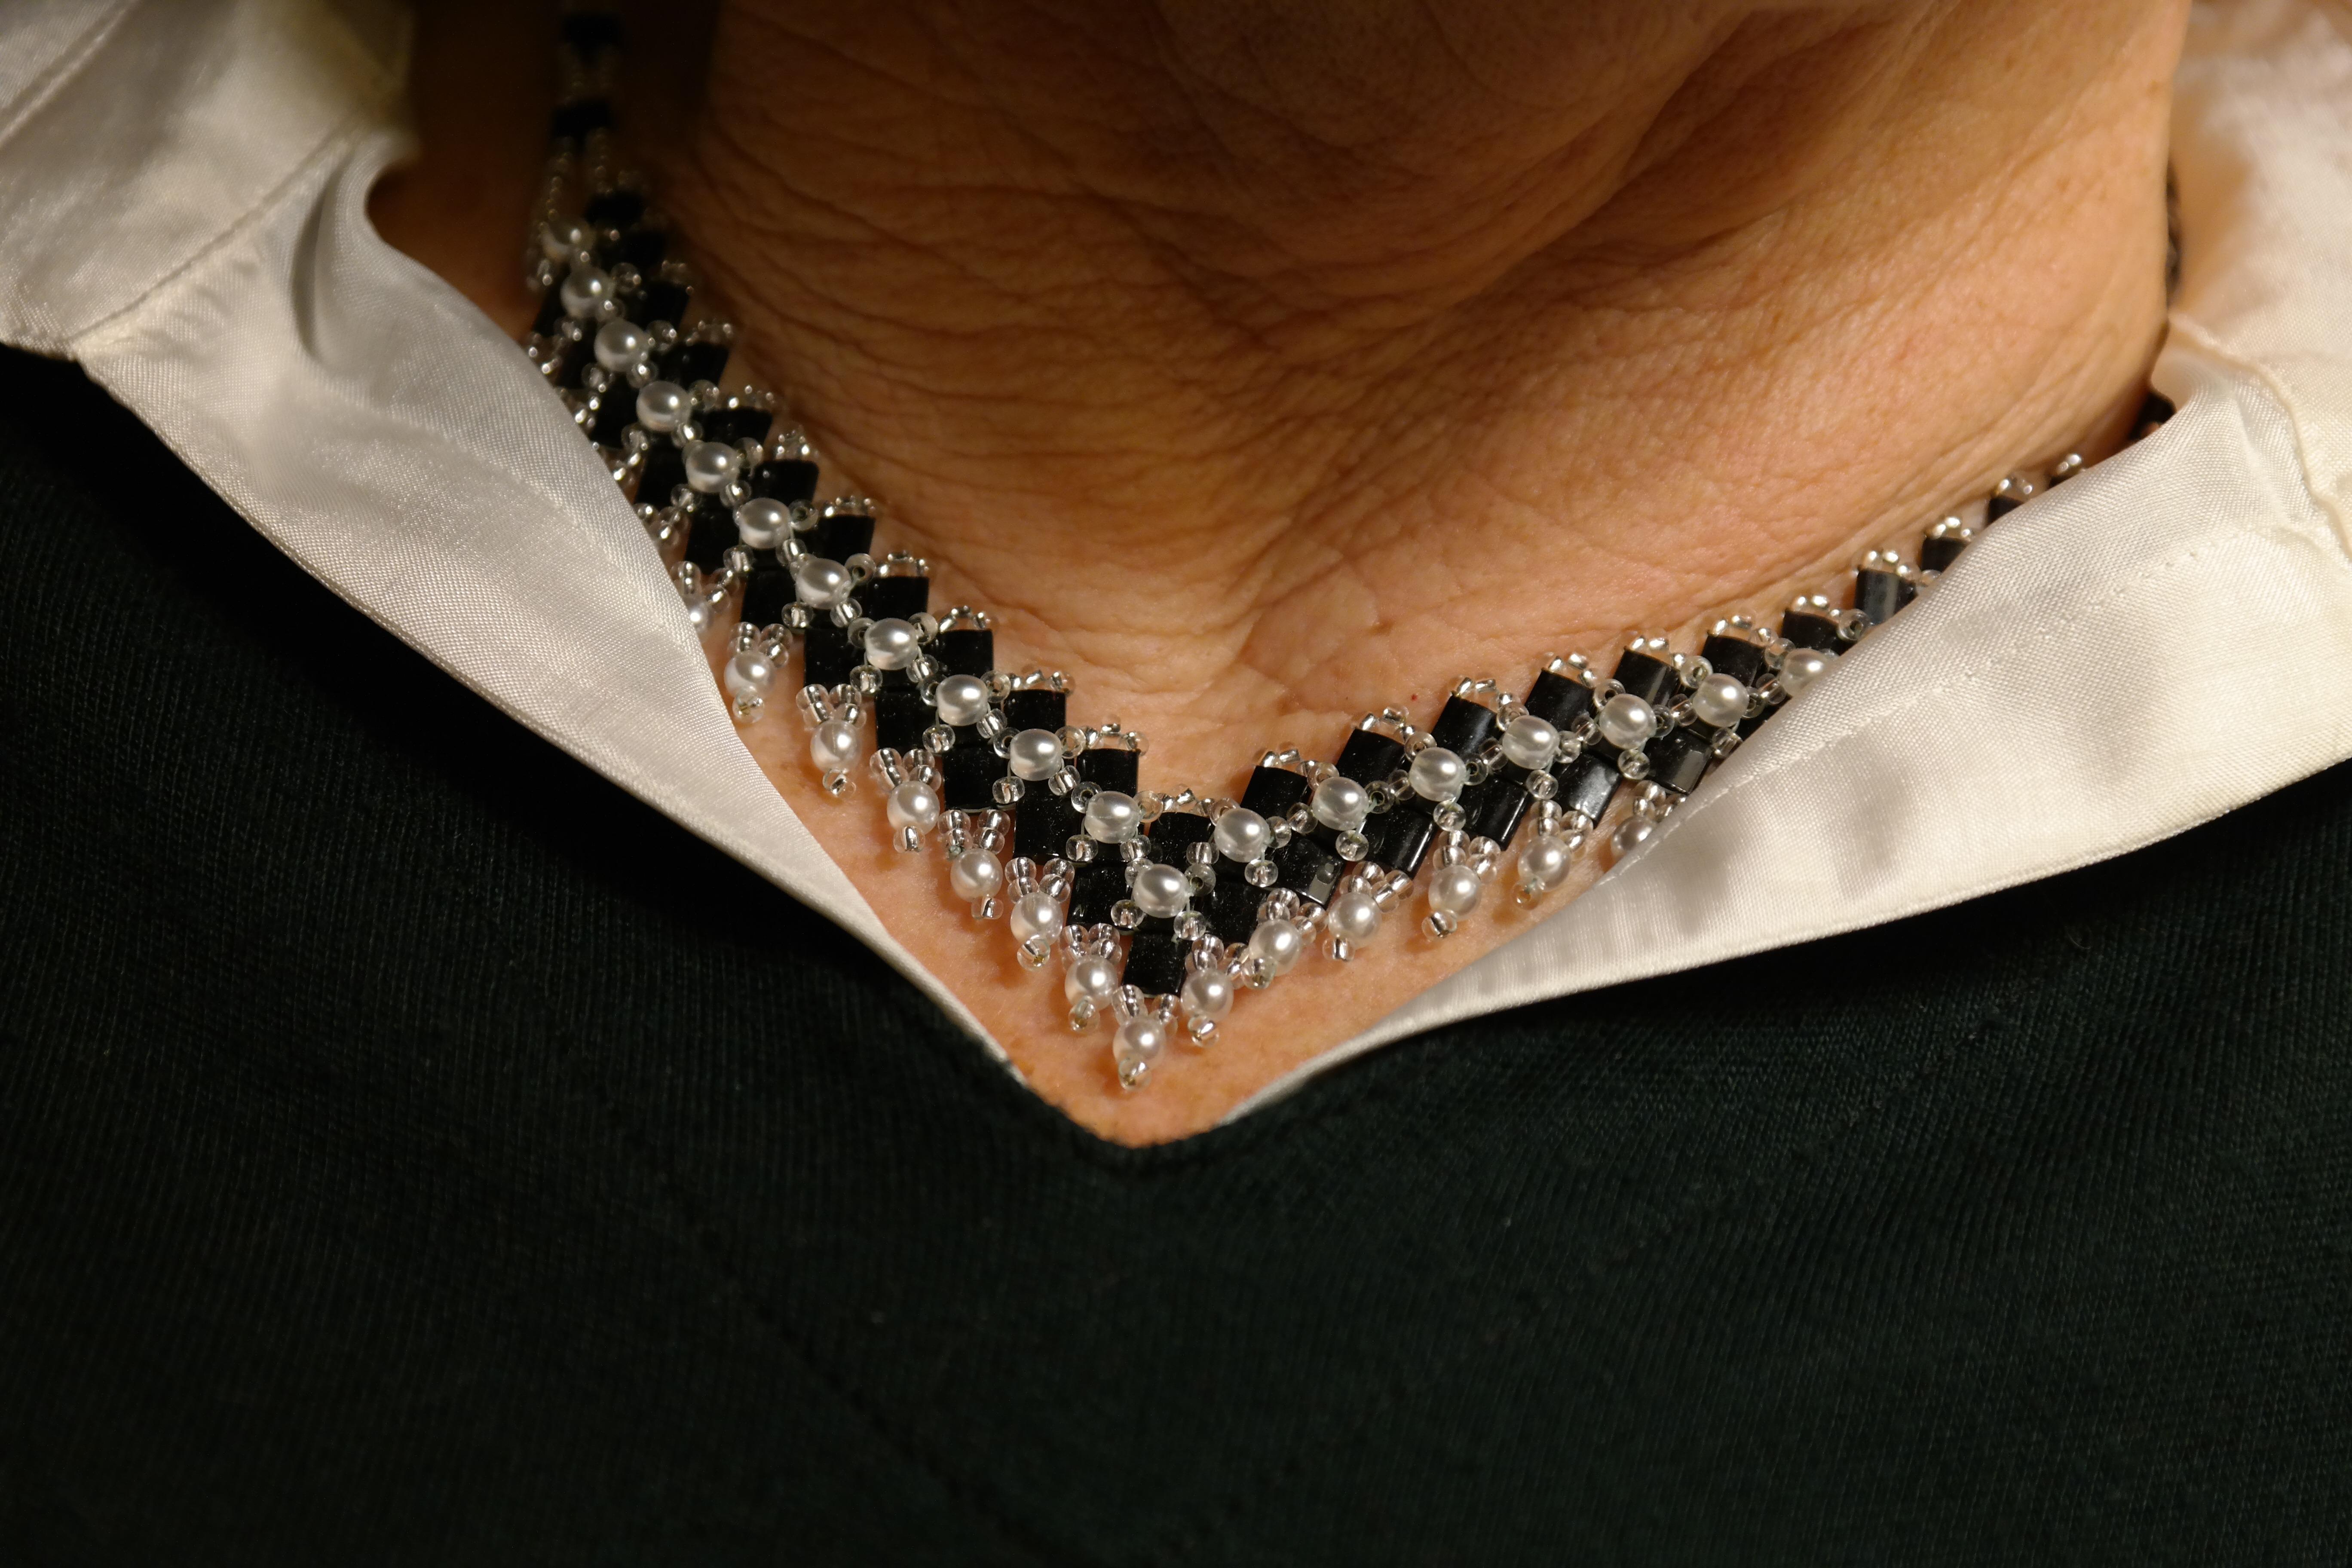 3ab56089185d mano mujer cadena ropa negro material collar pulsera joyería textil cuello  blusa Accesorio de moda Public Domain. Al igual que Pxhere en Facebook